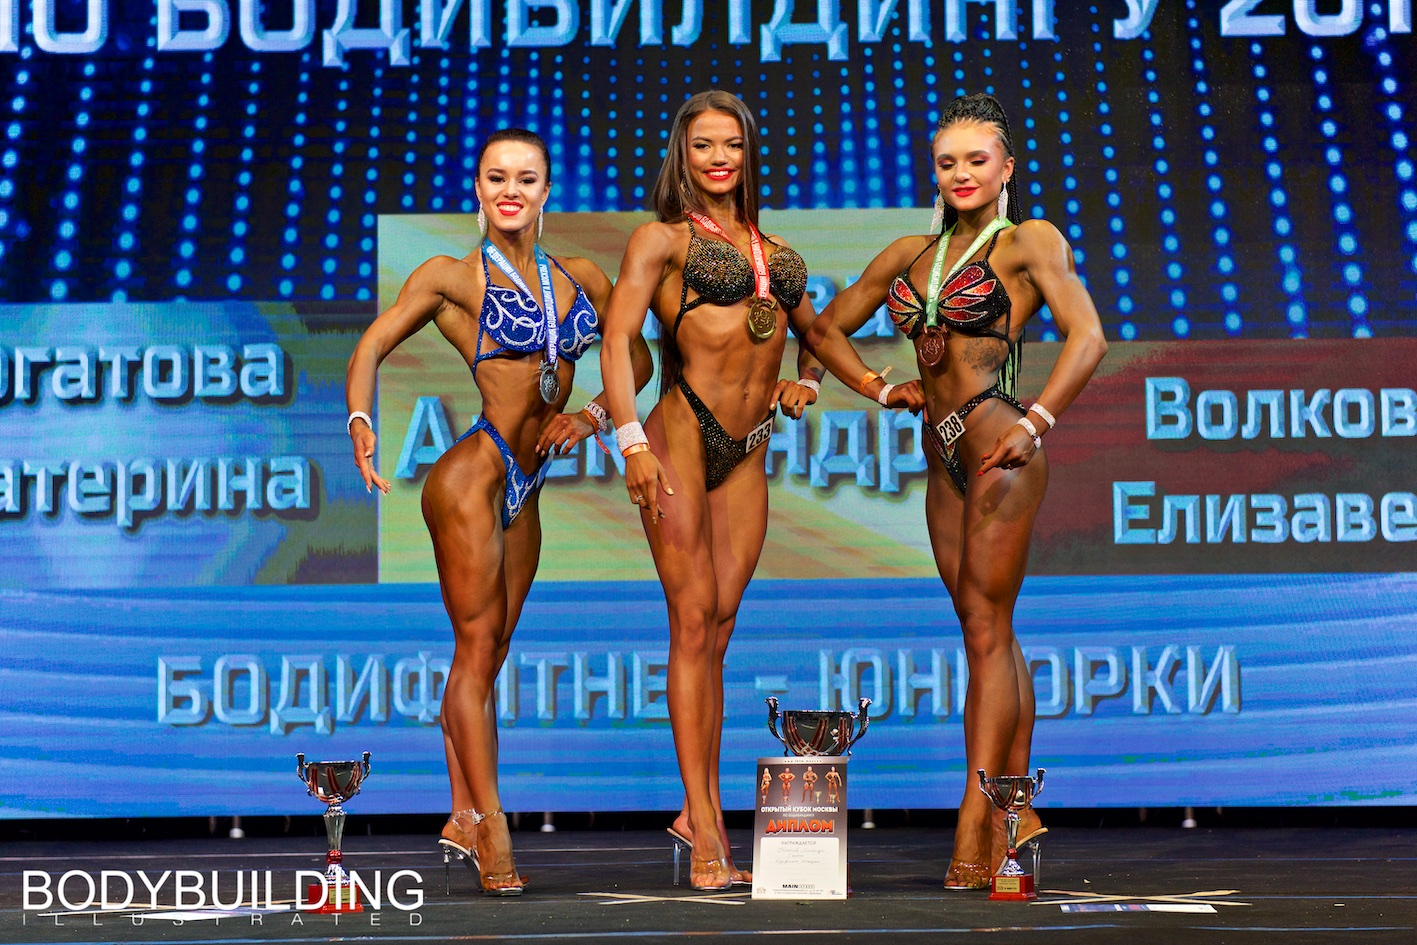 Кубок Москвы по бодибилдингу 2019 бодифитнес